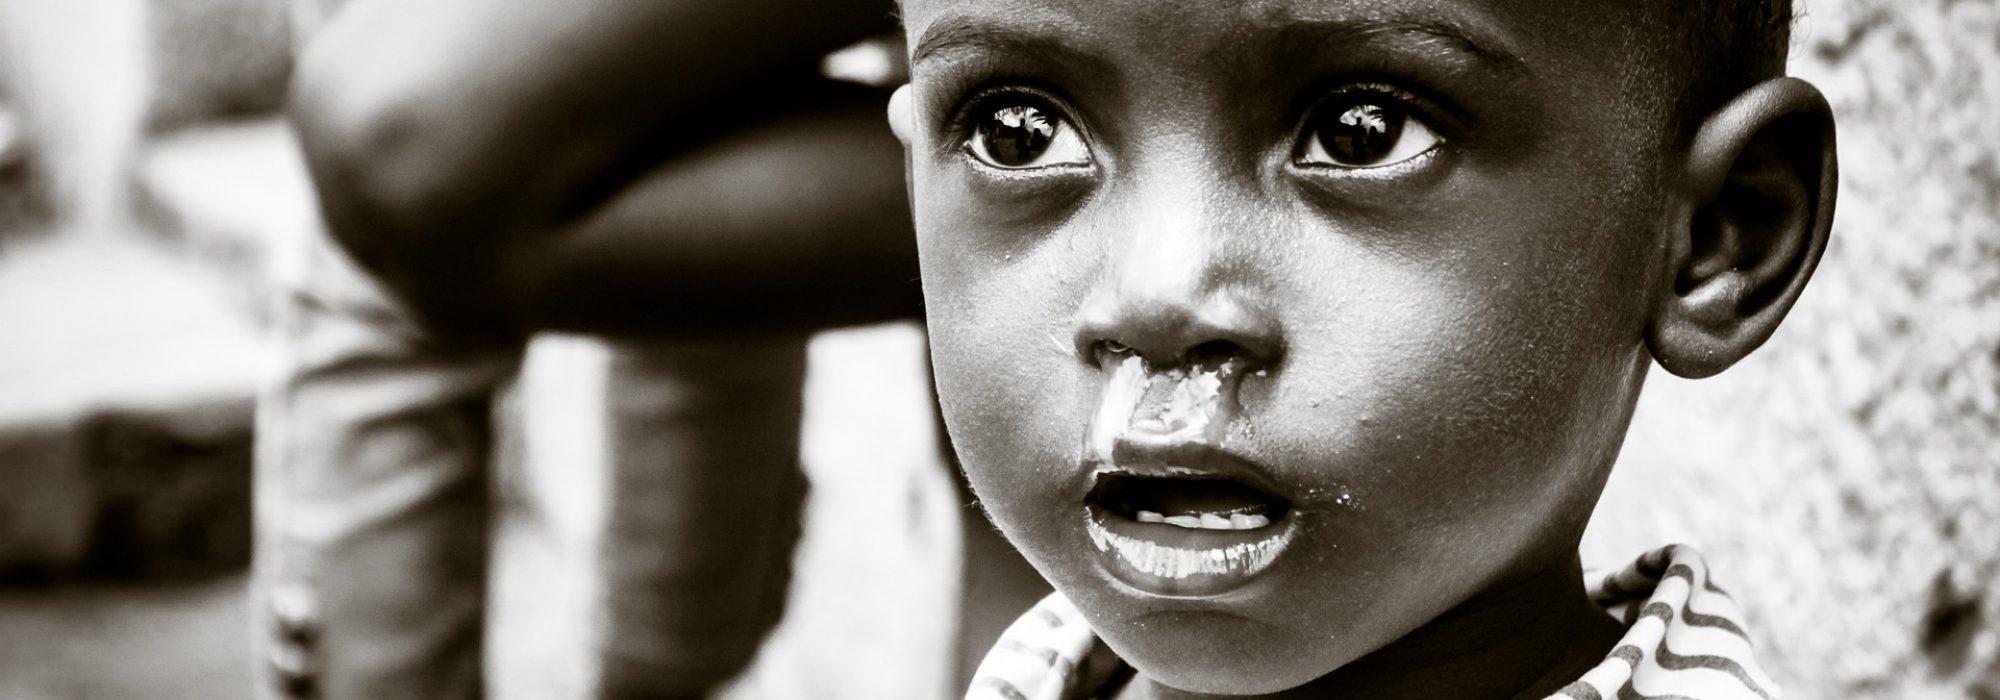 african-child-ga6dce754e_1920